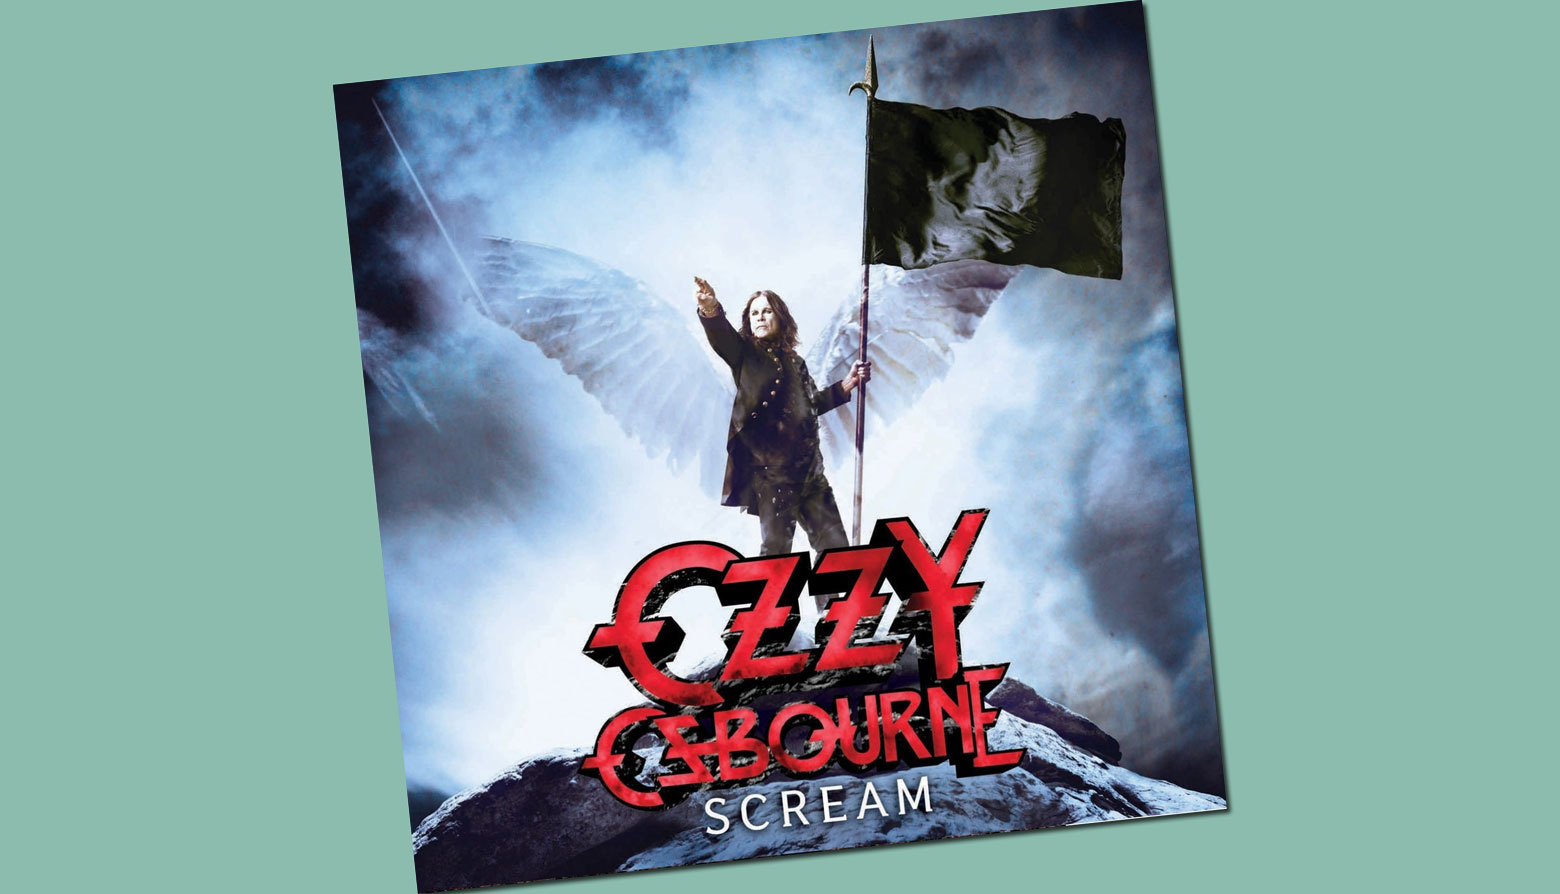 Ozzy-Osbourne-Scream